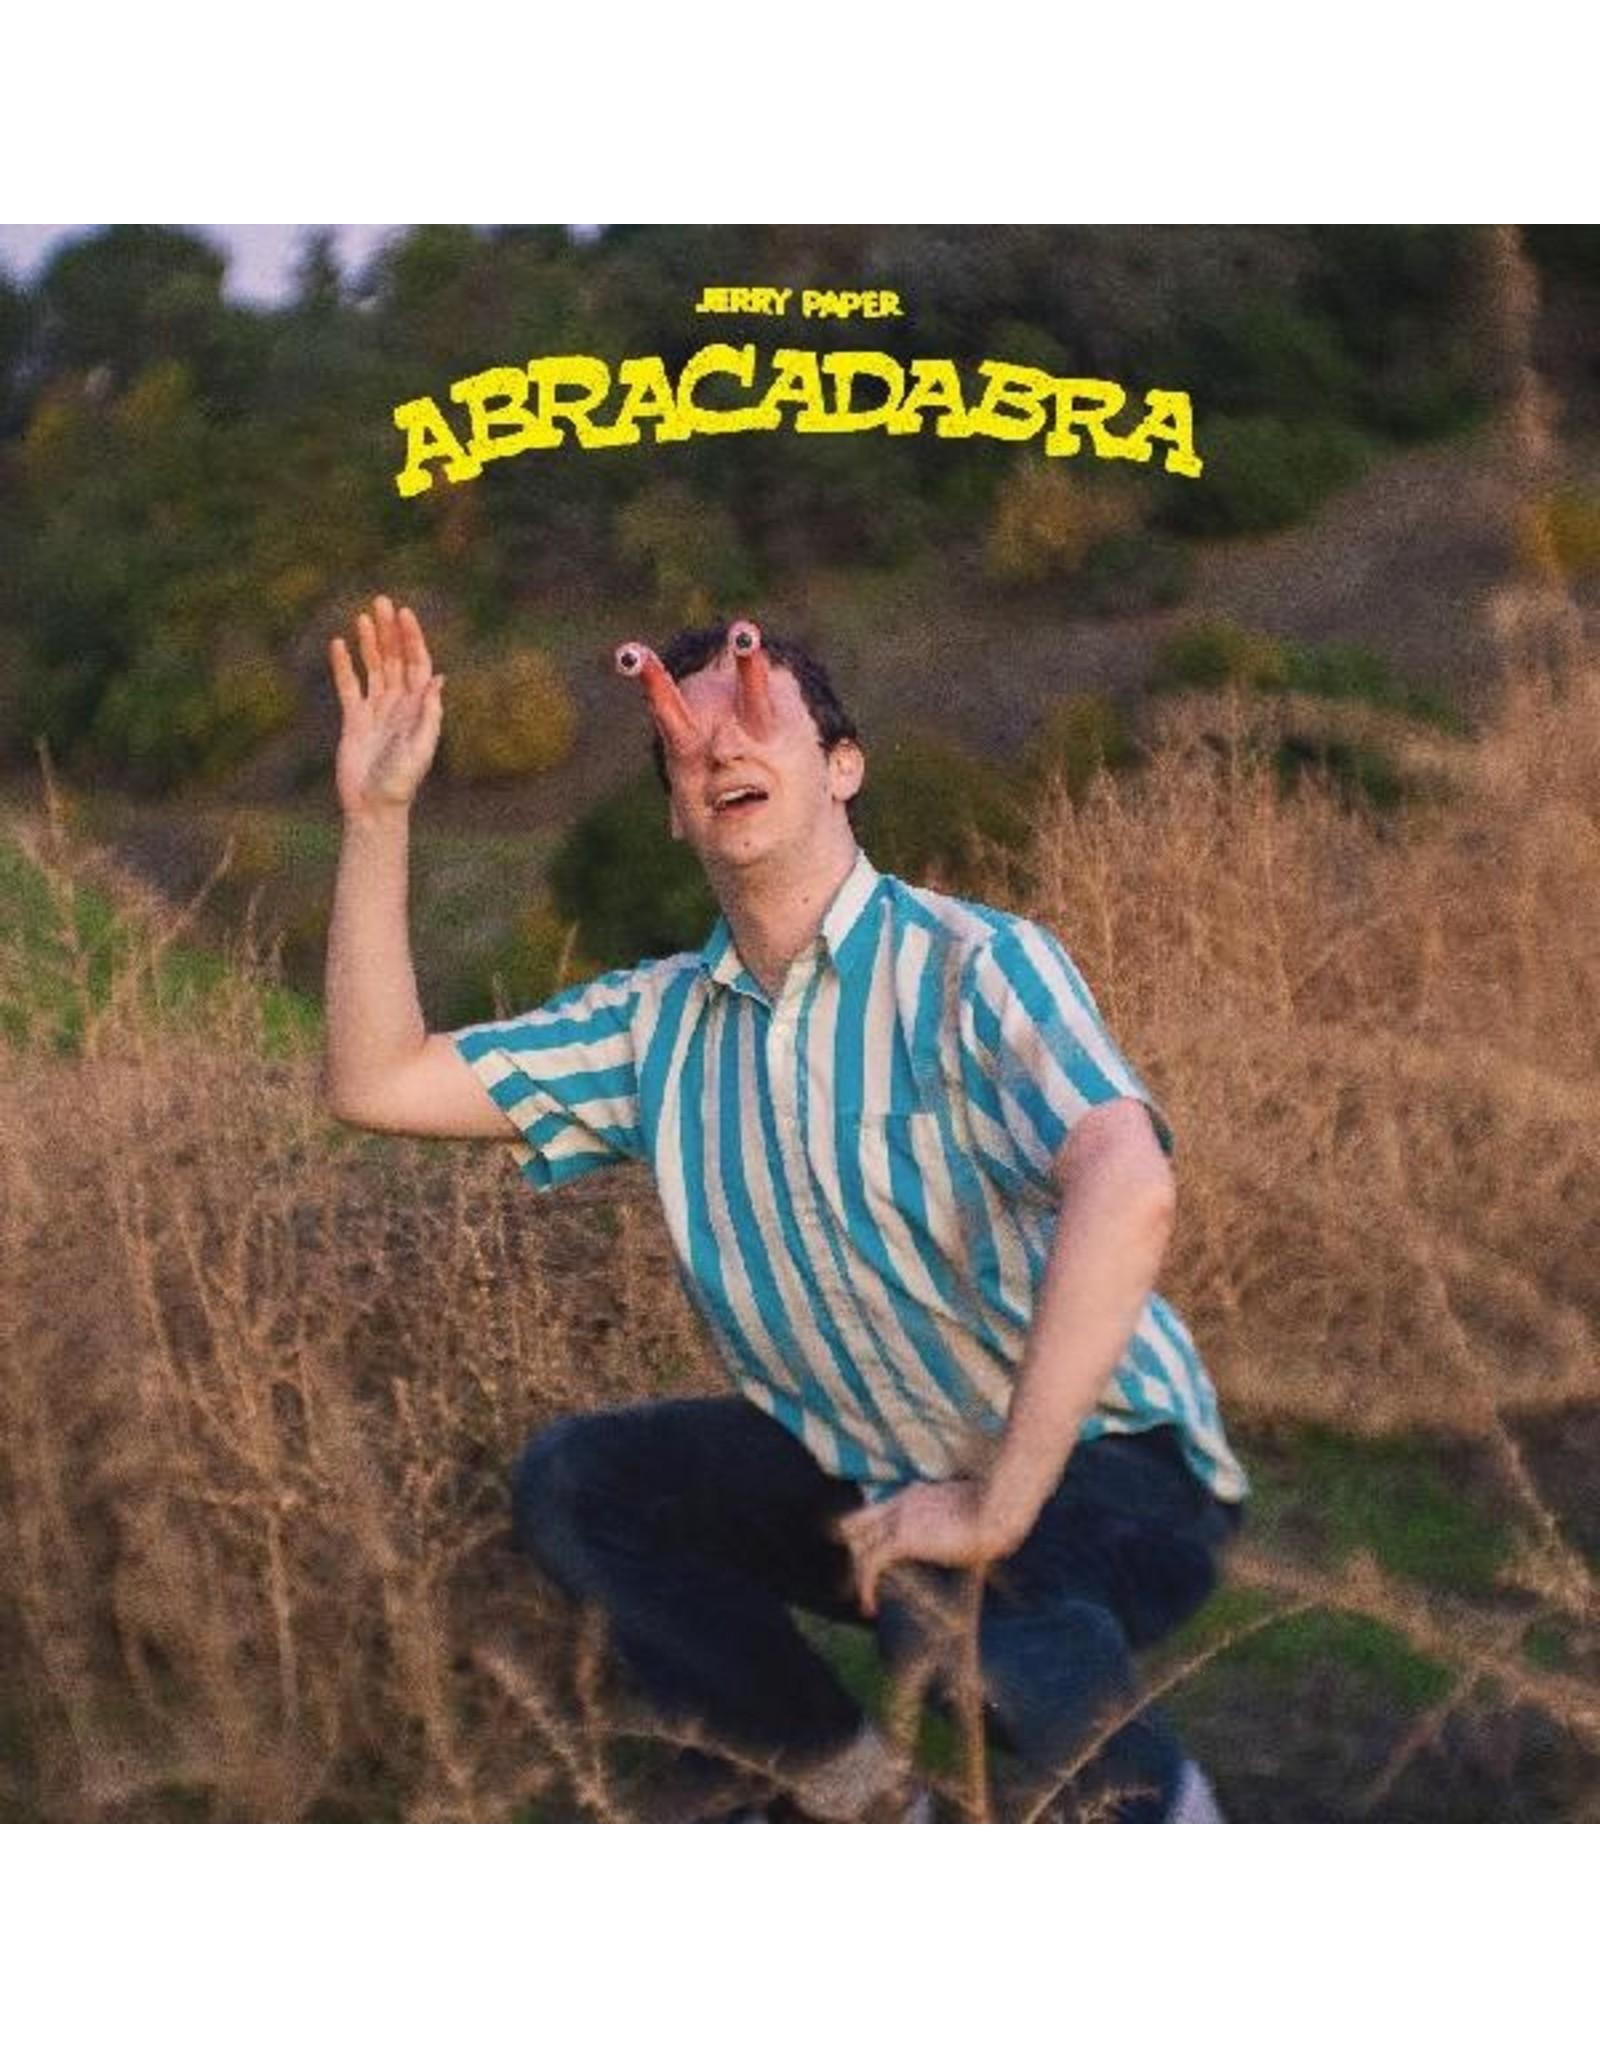 New Vinyl Jerry Paper - Abracadabra (Colored) LP